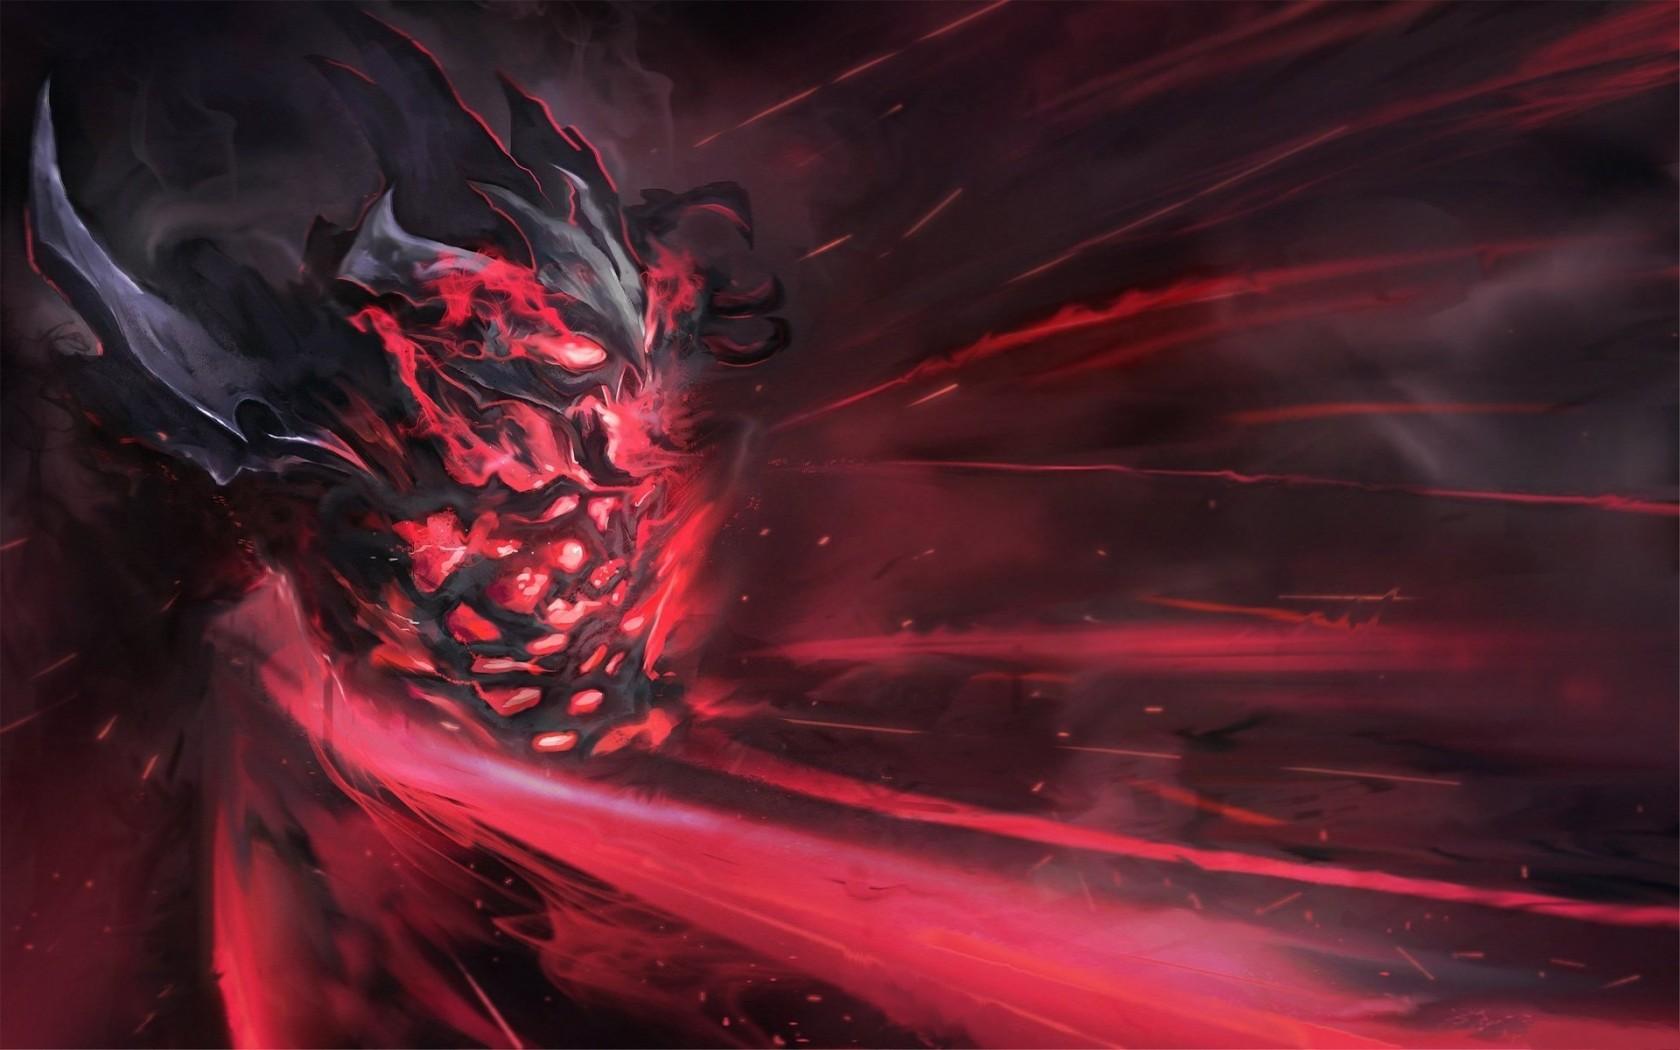 Wallpaper  video games fire Dota 2 Nevermore shadow